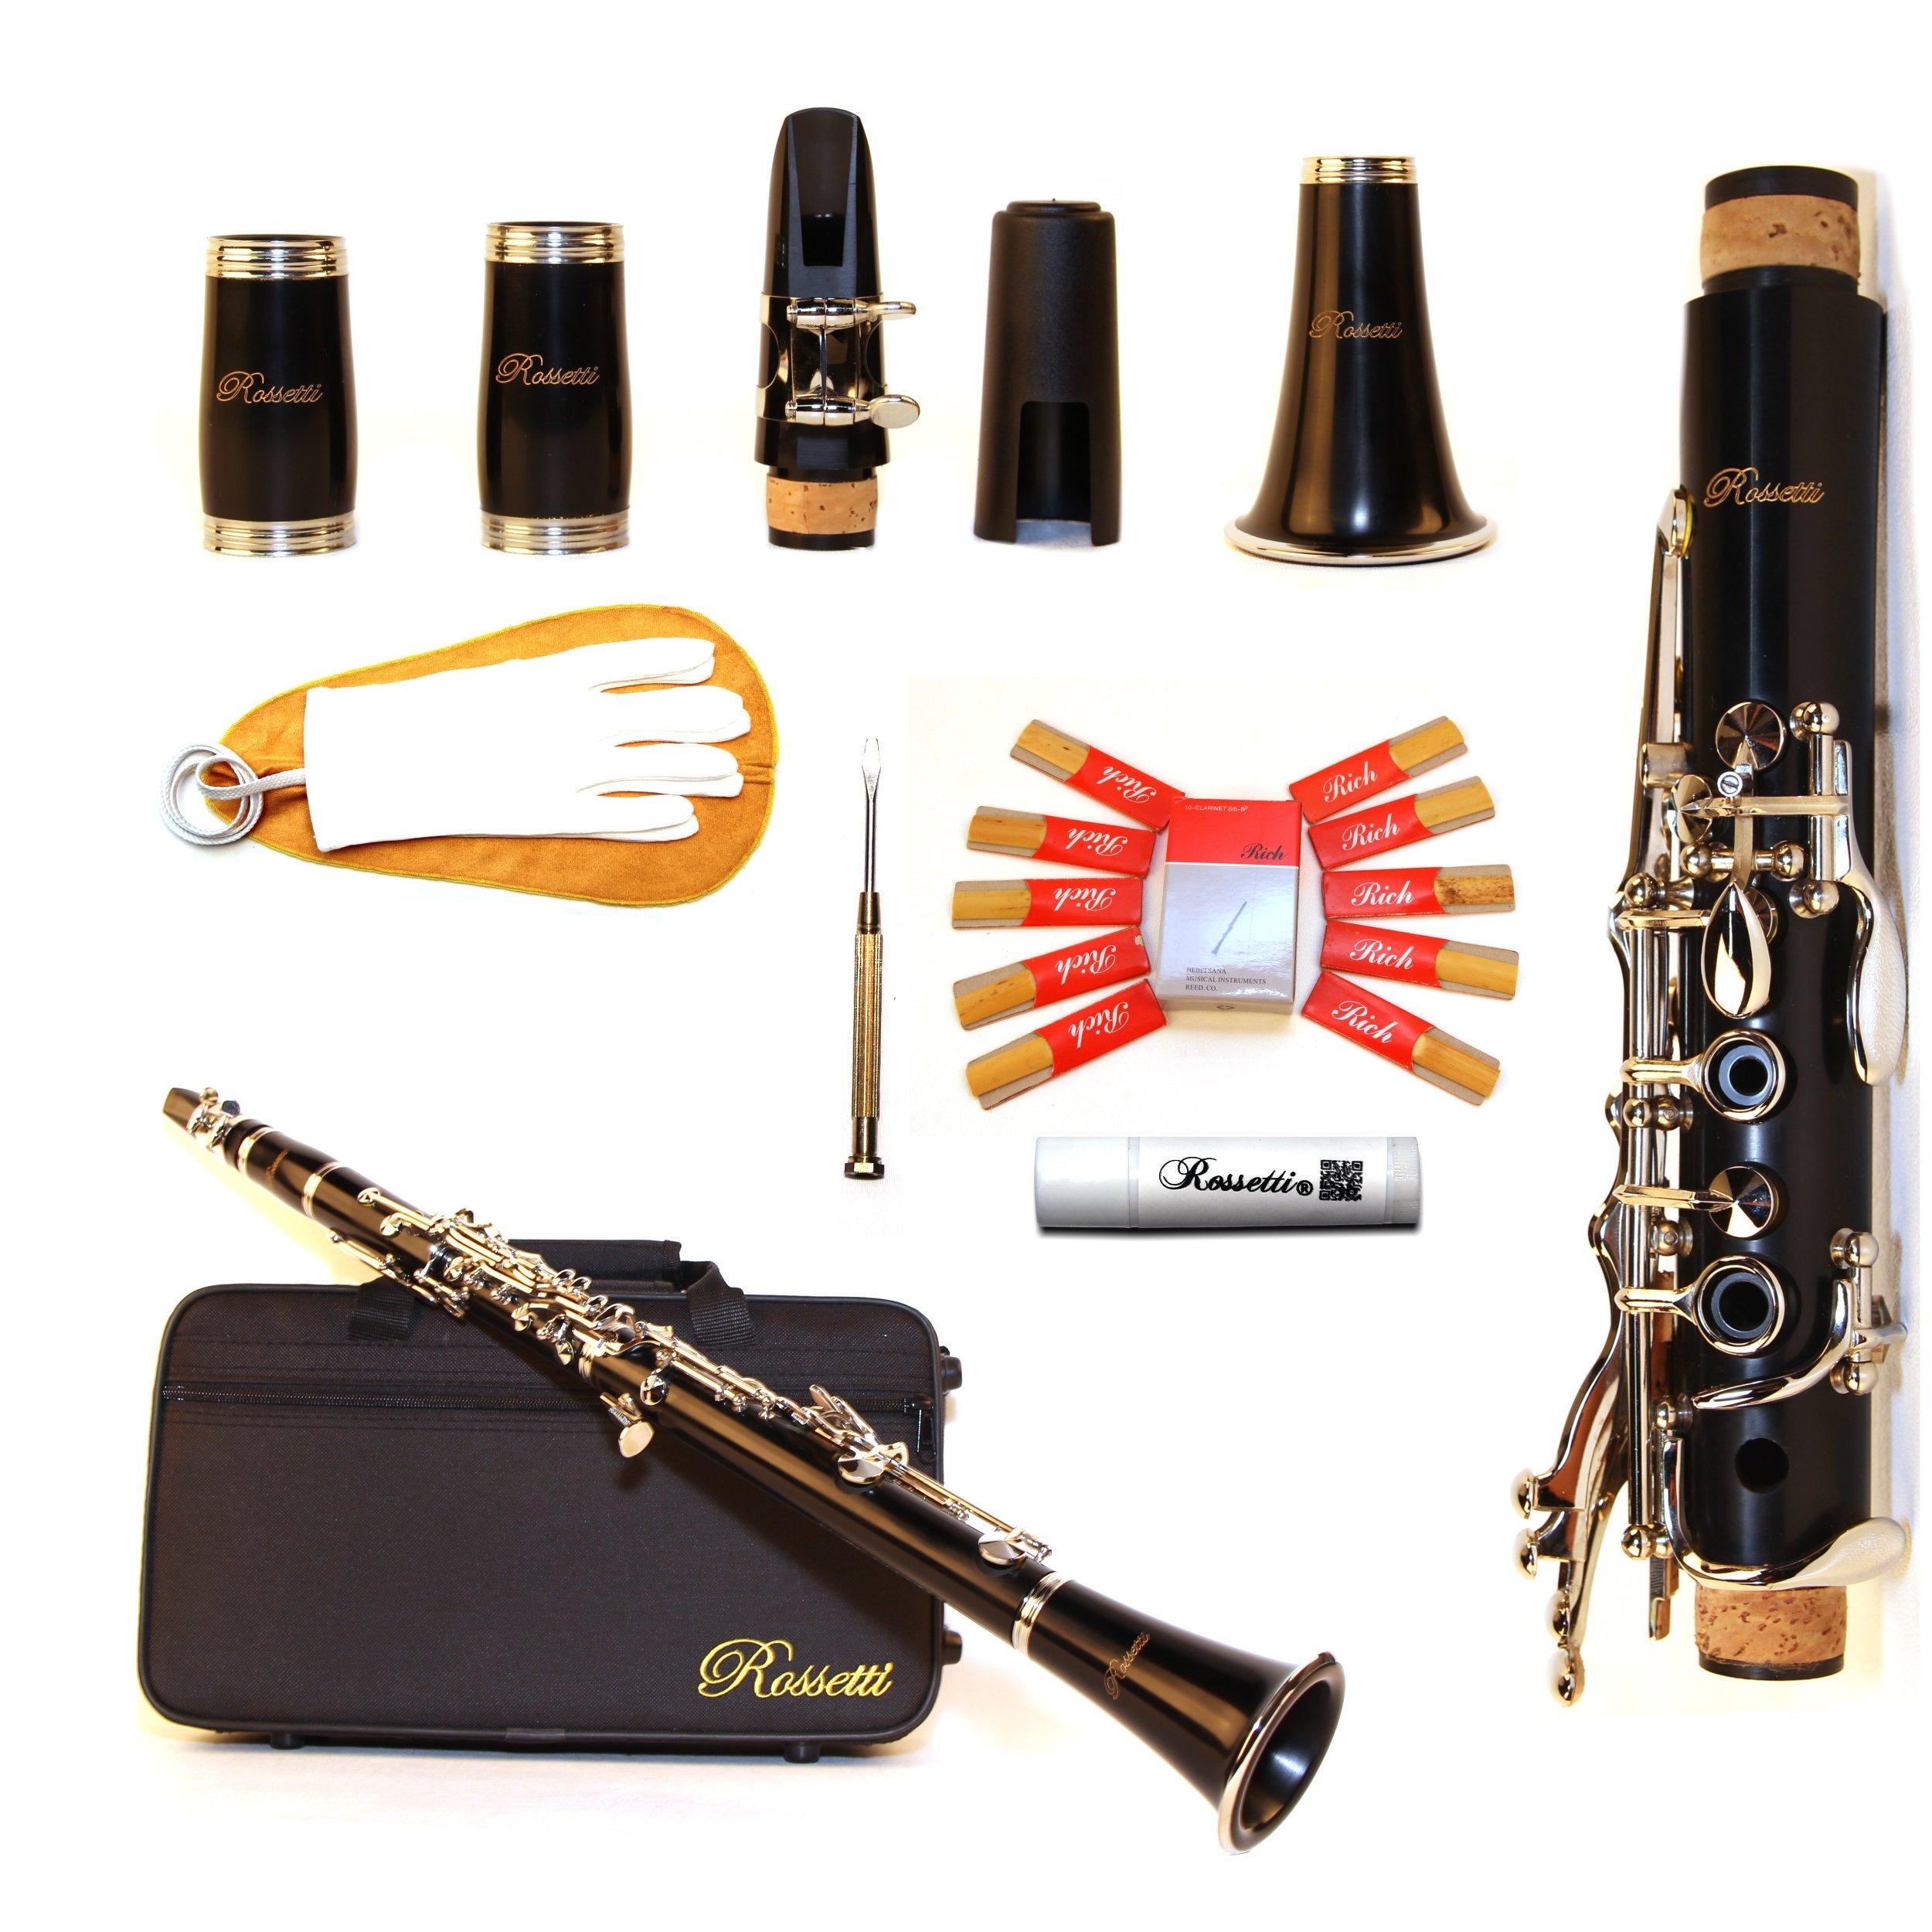 Rossetti Intermediate Soprano Bb Clarinet Black, ROS1149 by Rossetti